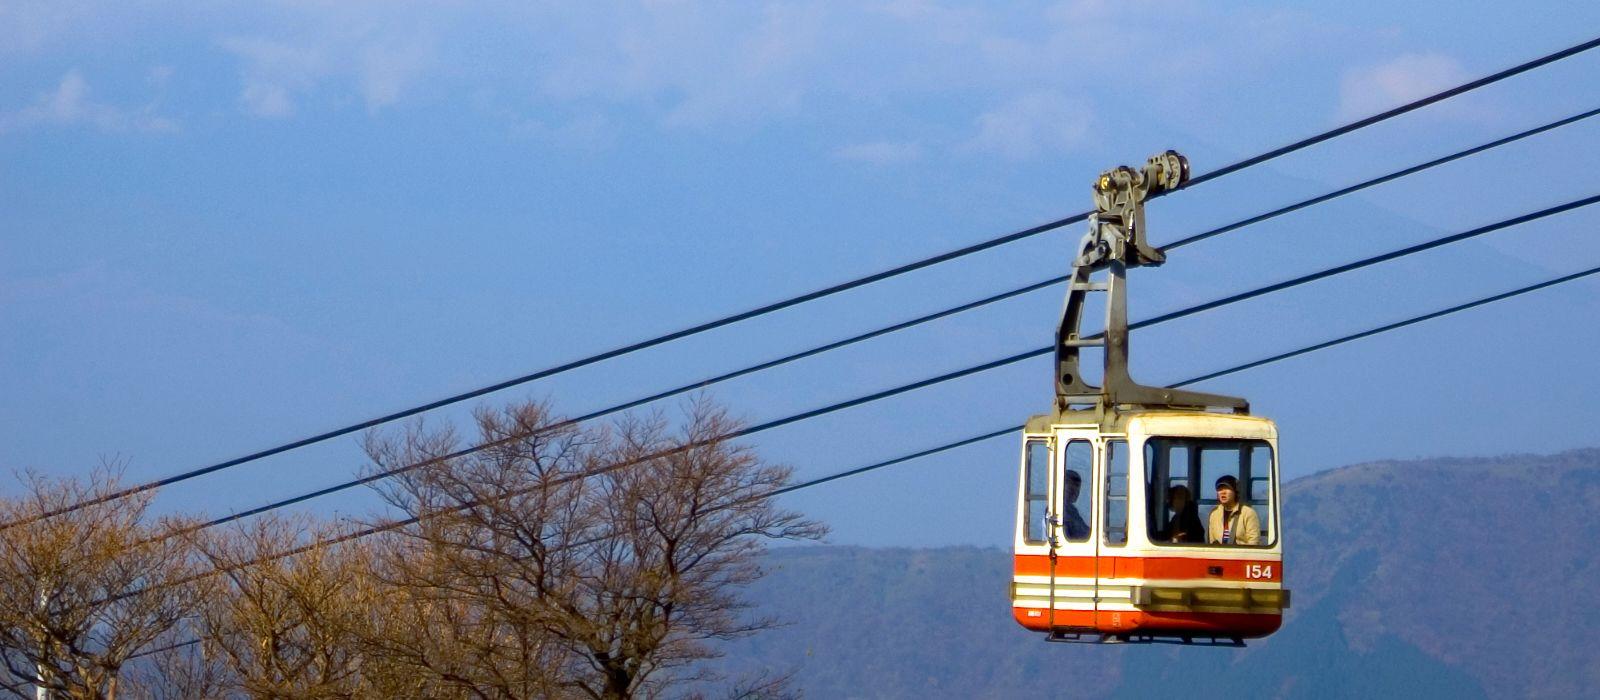 Reiseziel Hakone Japan